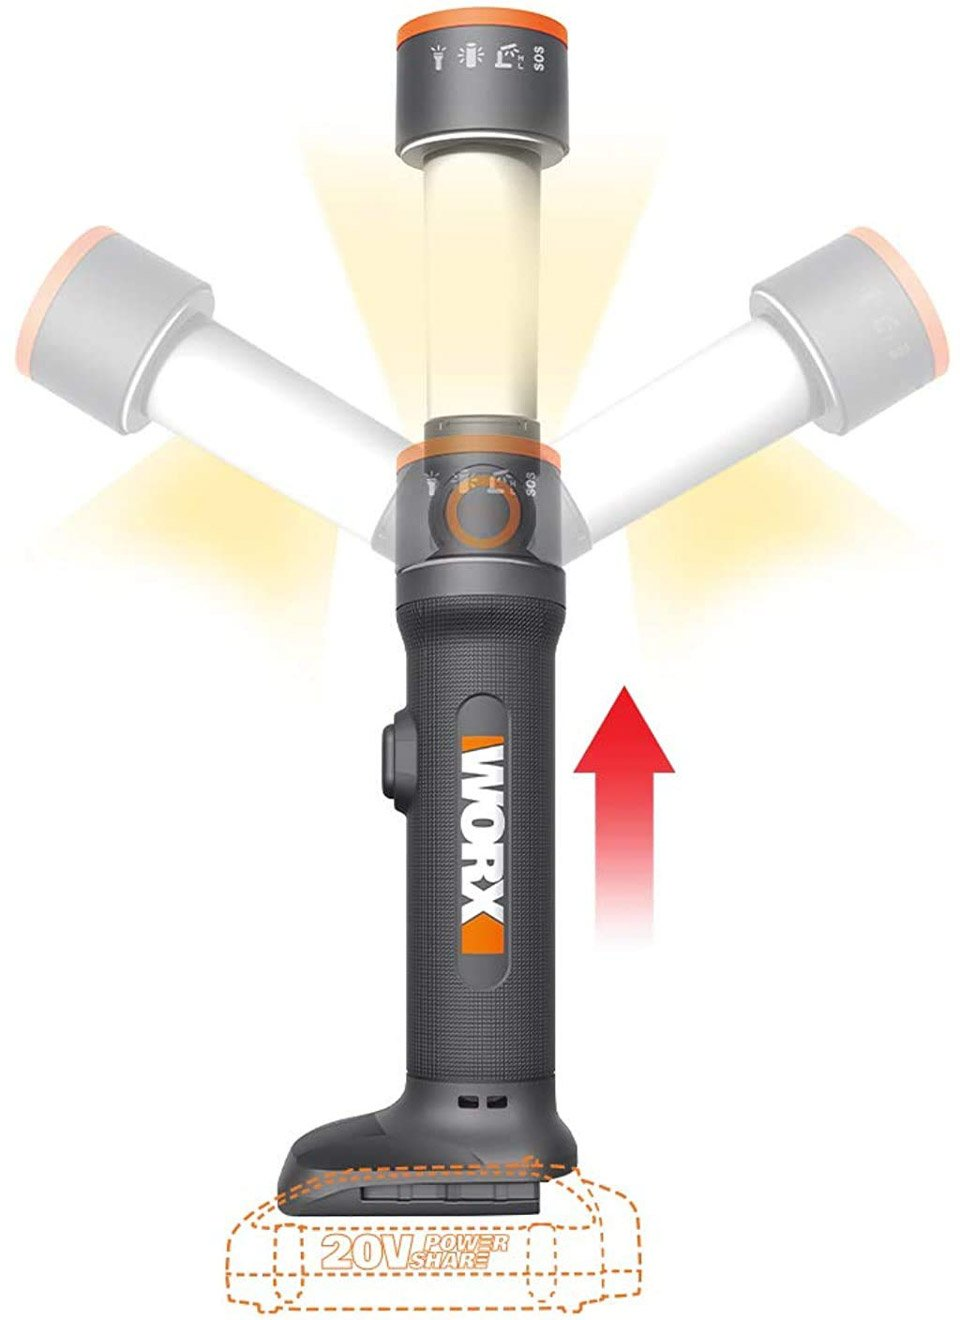 Worx Multi-function Light